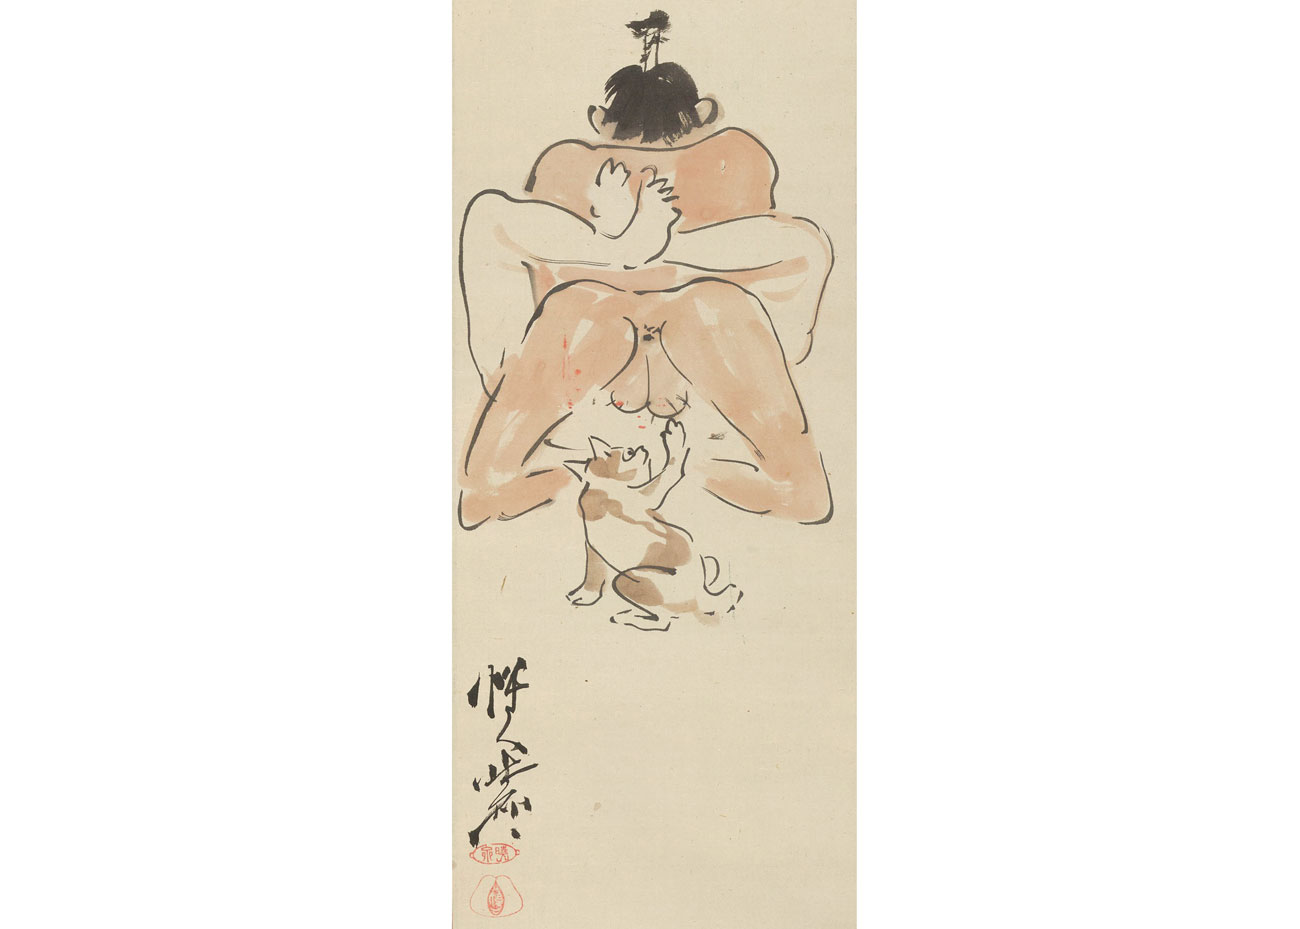 Shunga Woodblock Print by Kawanabe Kyosai, 1870s